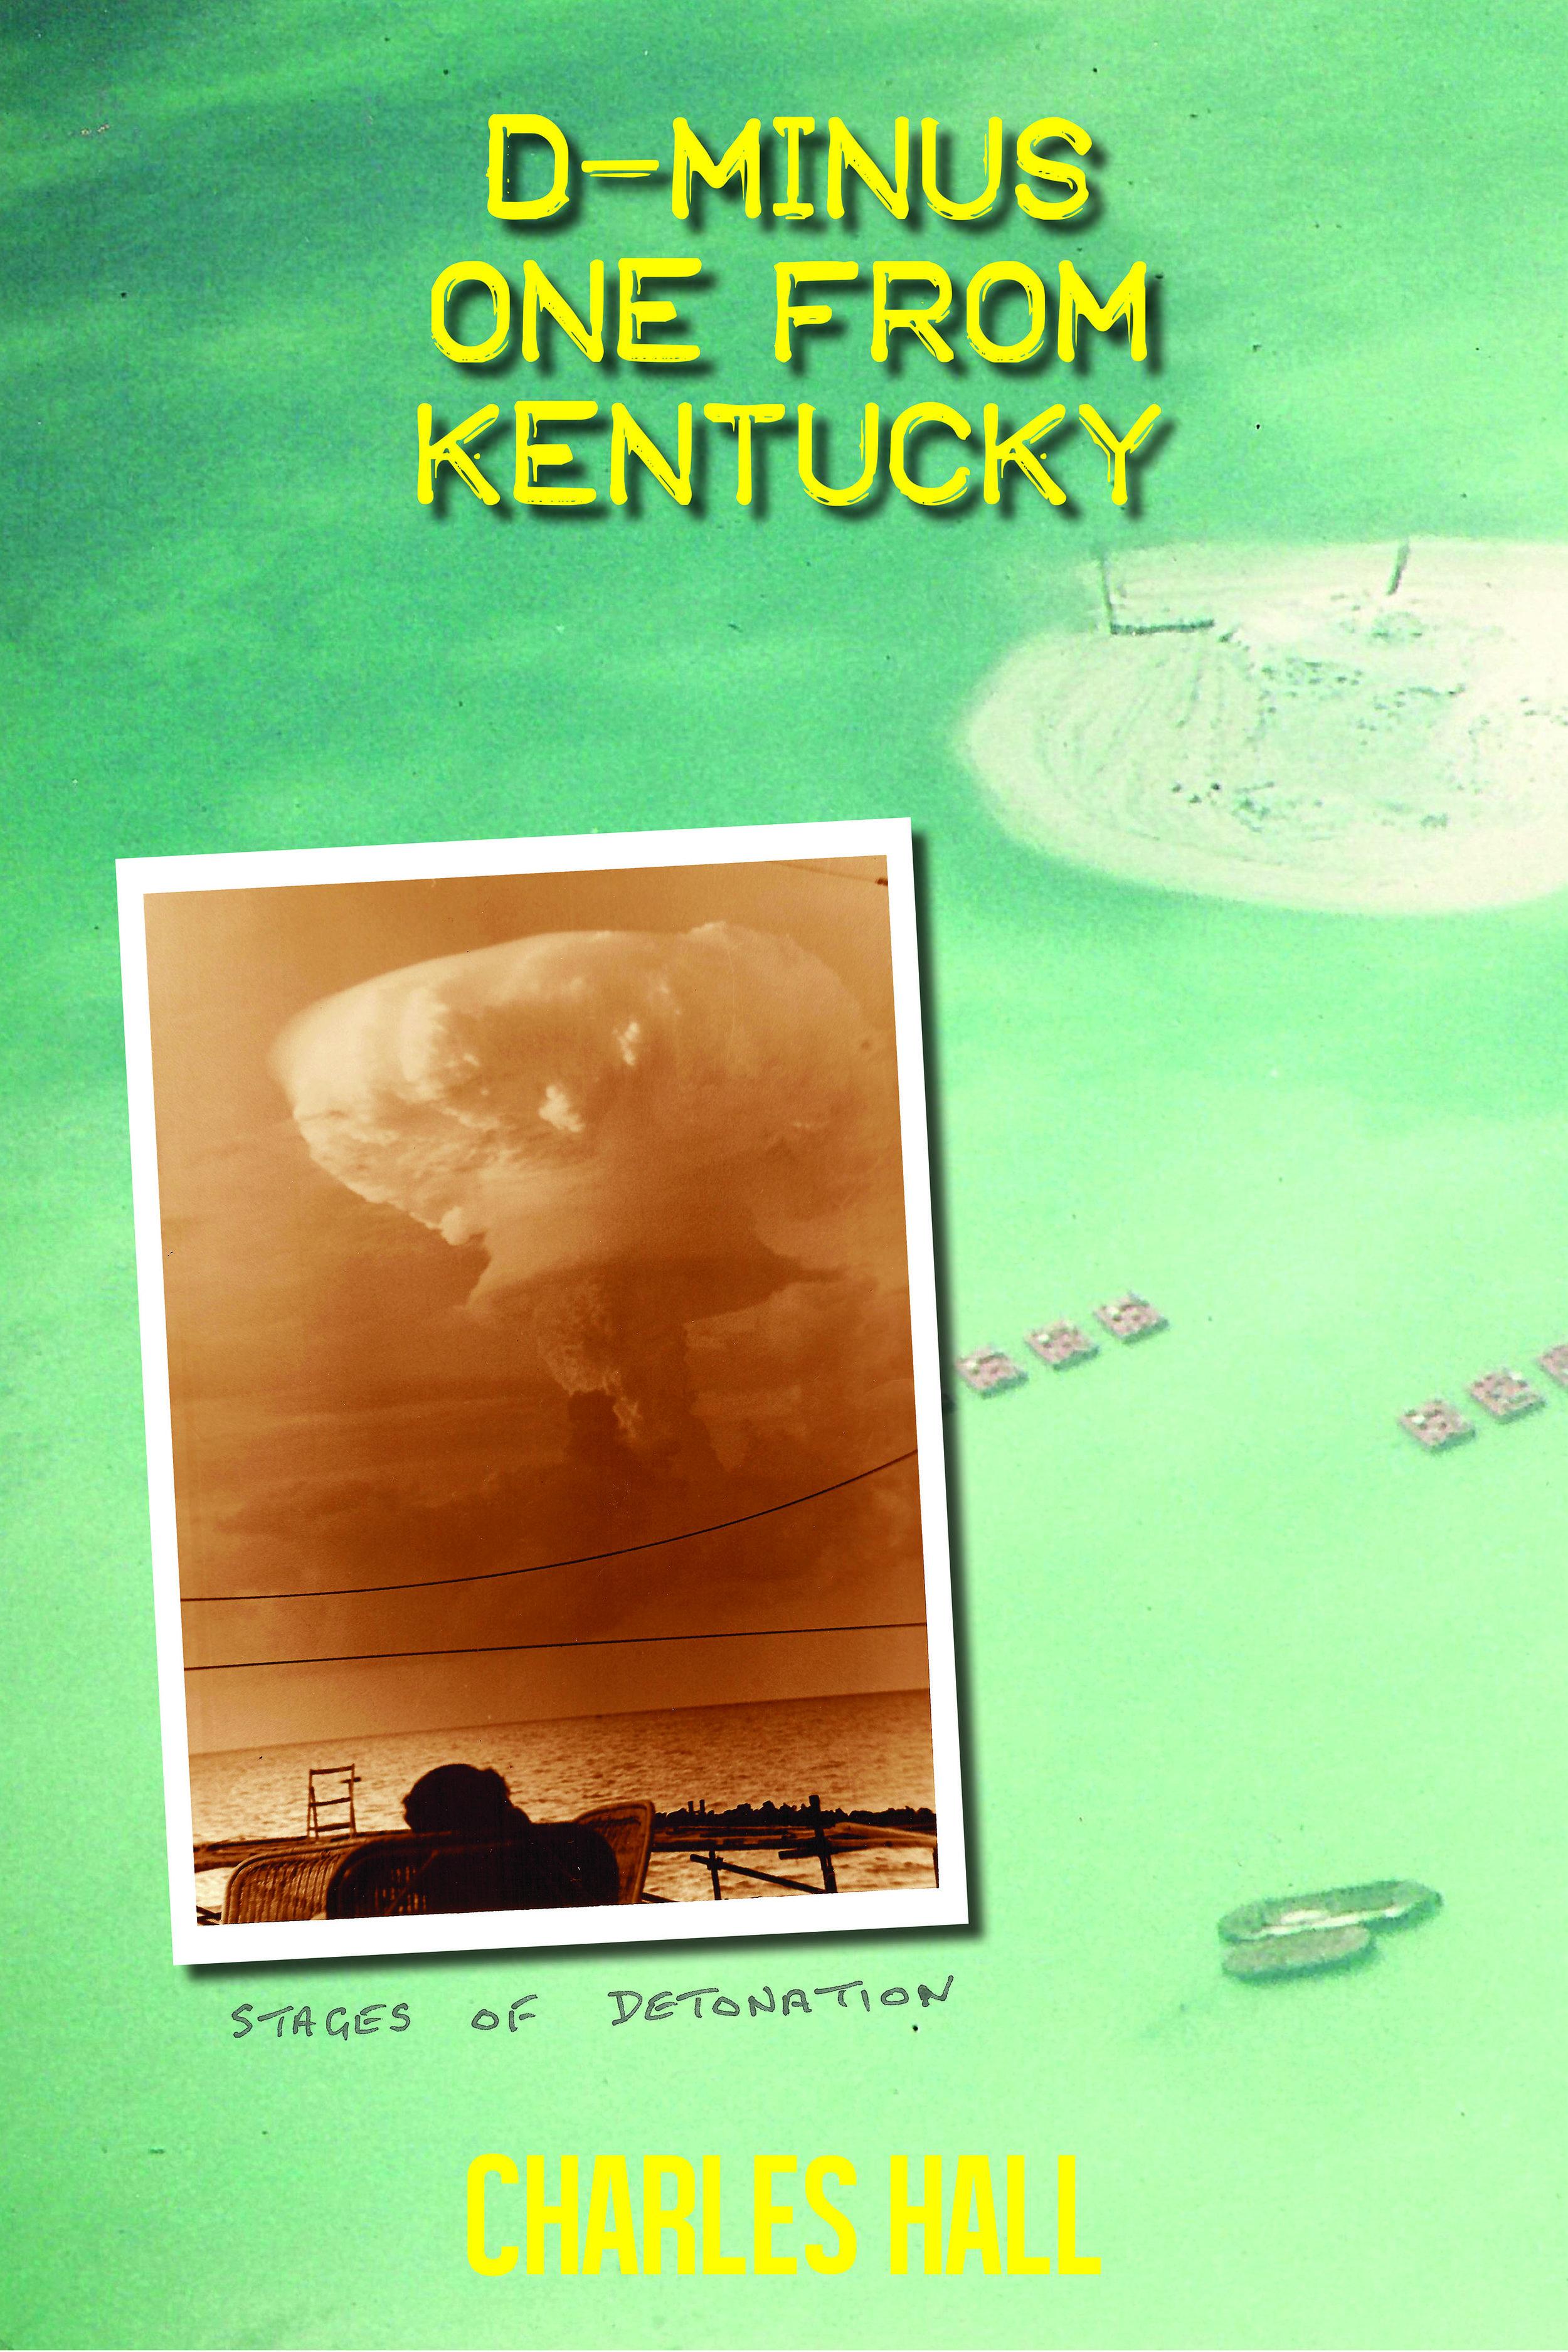 D-Minus Book Cover.jpg